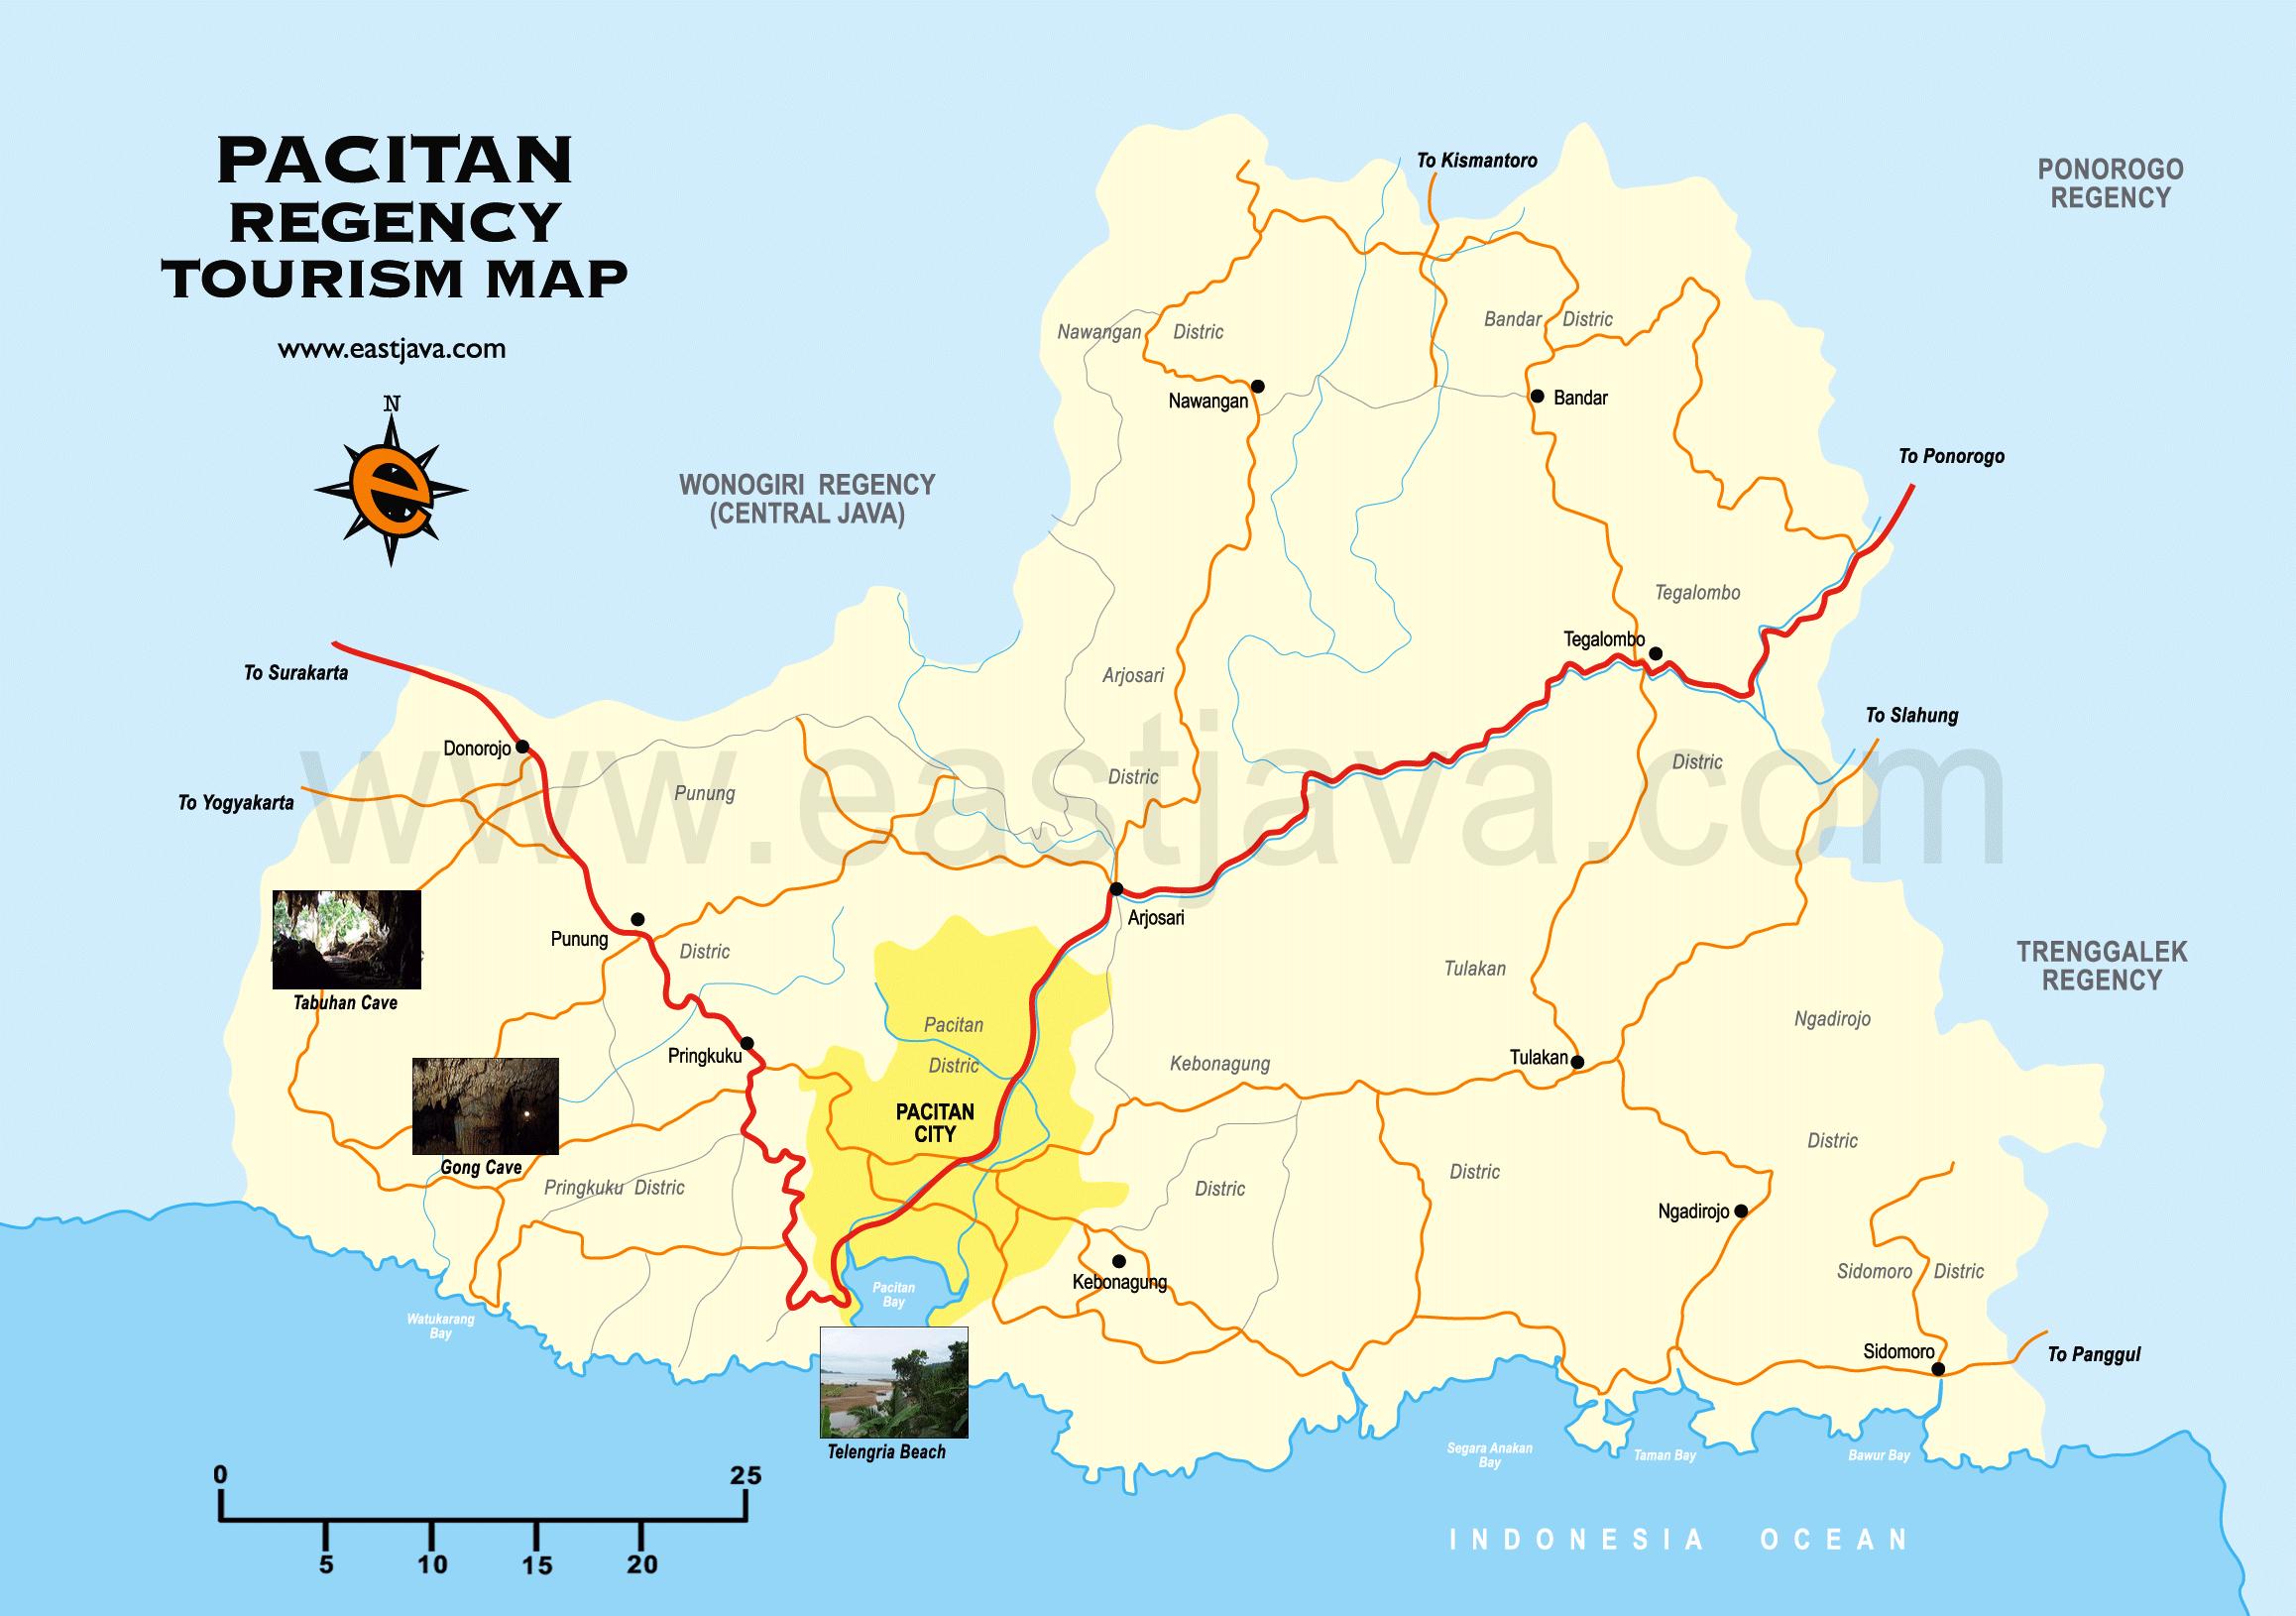 Pacitanisme Tinta Harmoni Peta Kabupaten Pacitan Pantai Teleng Ria Kab